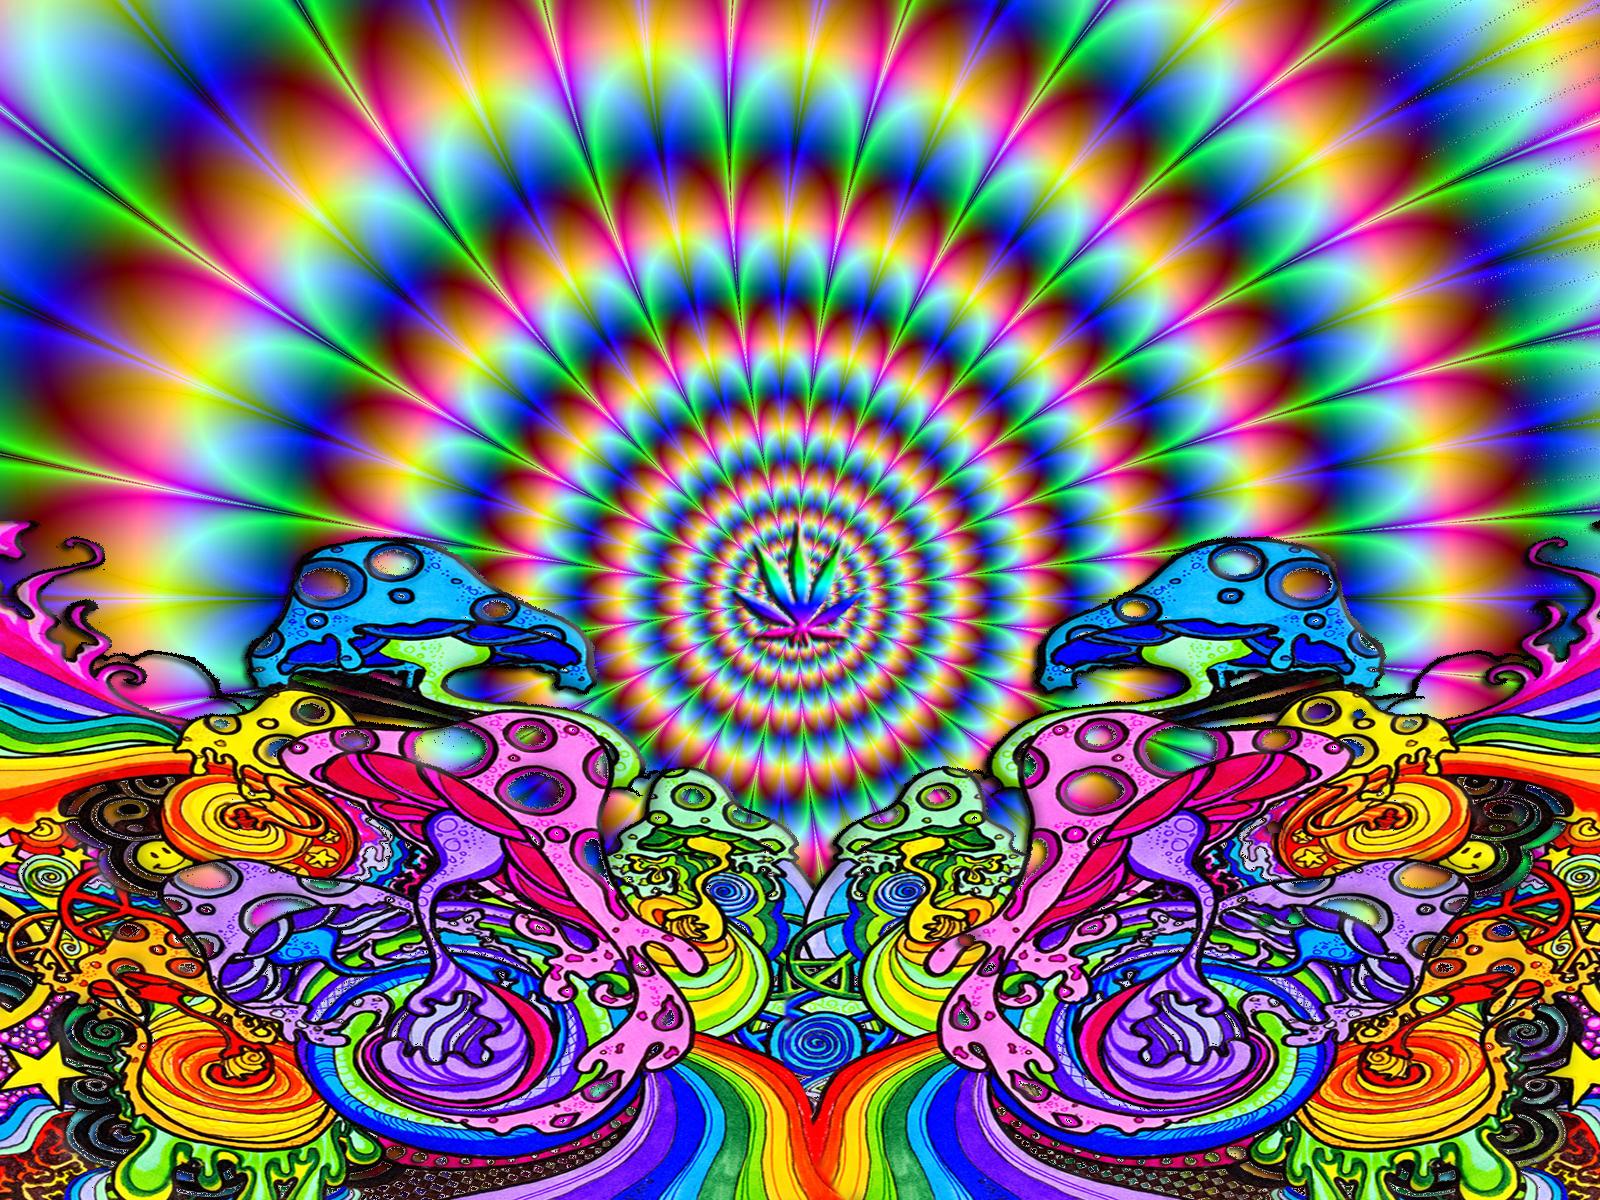 Trippy Wallpaper Art Download Wallpaper DaWallpaperz 1600x1200